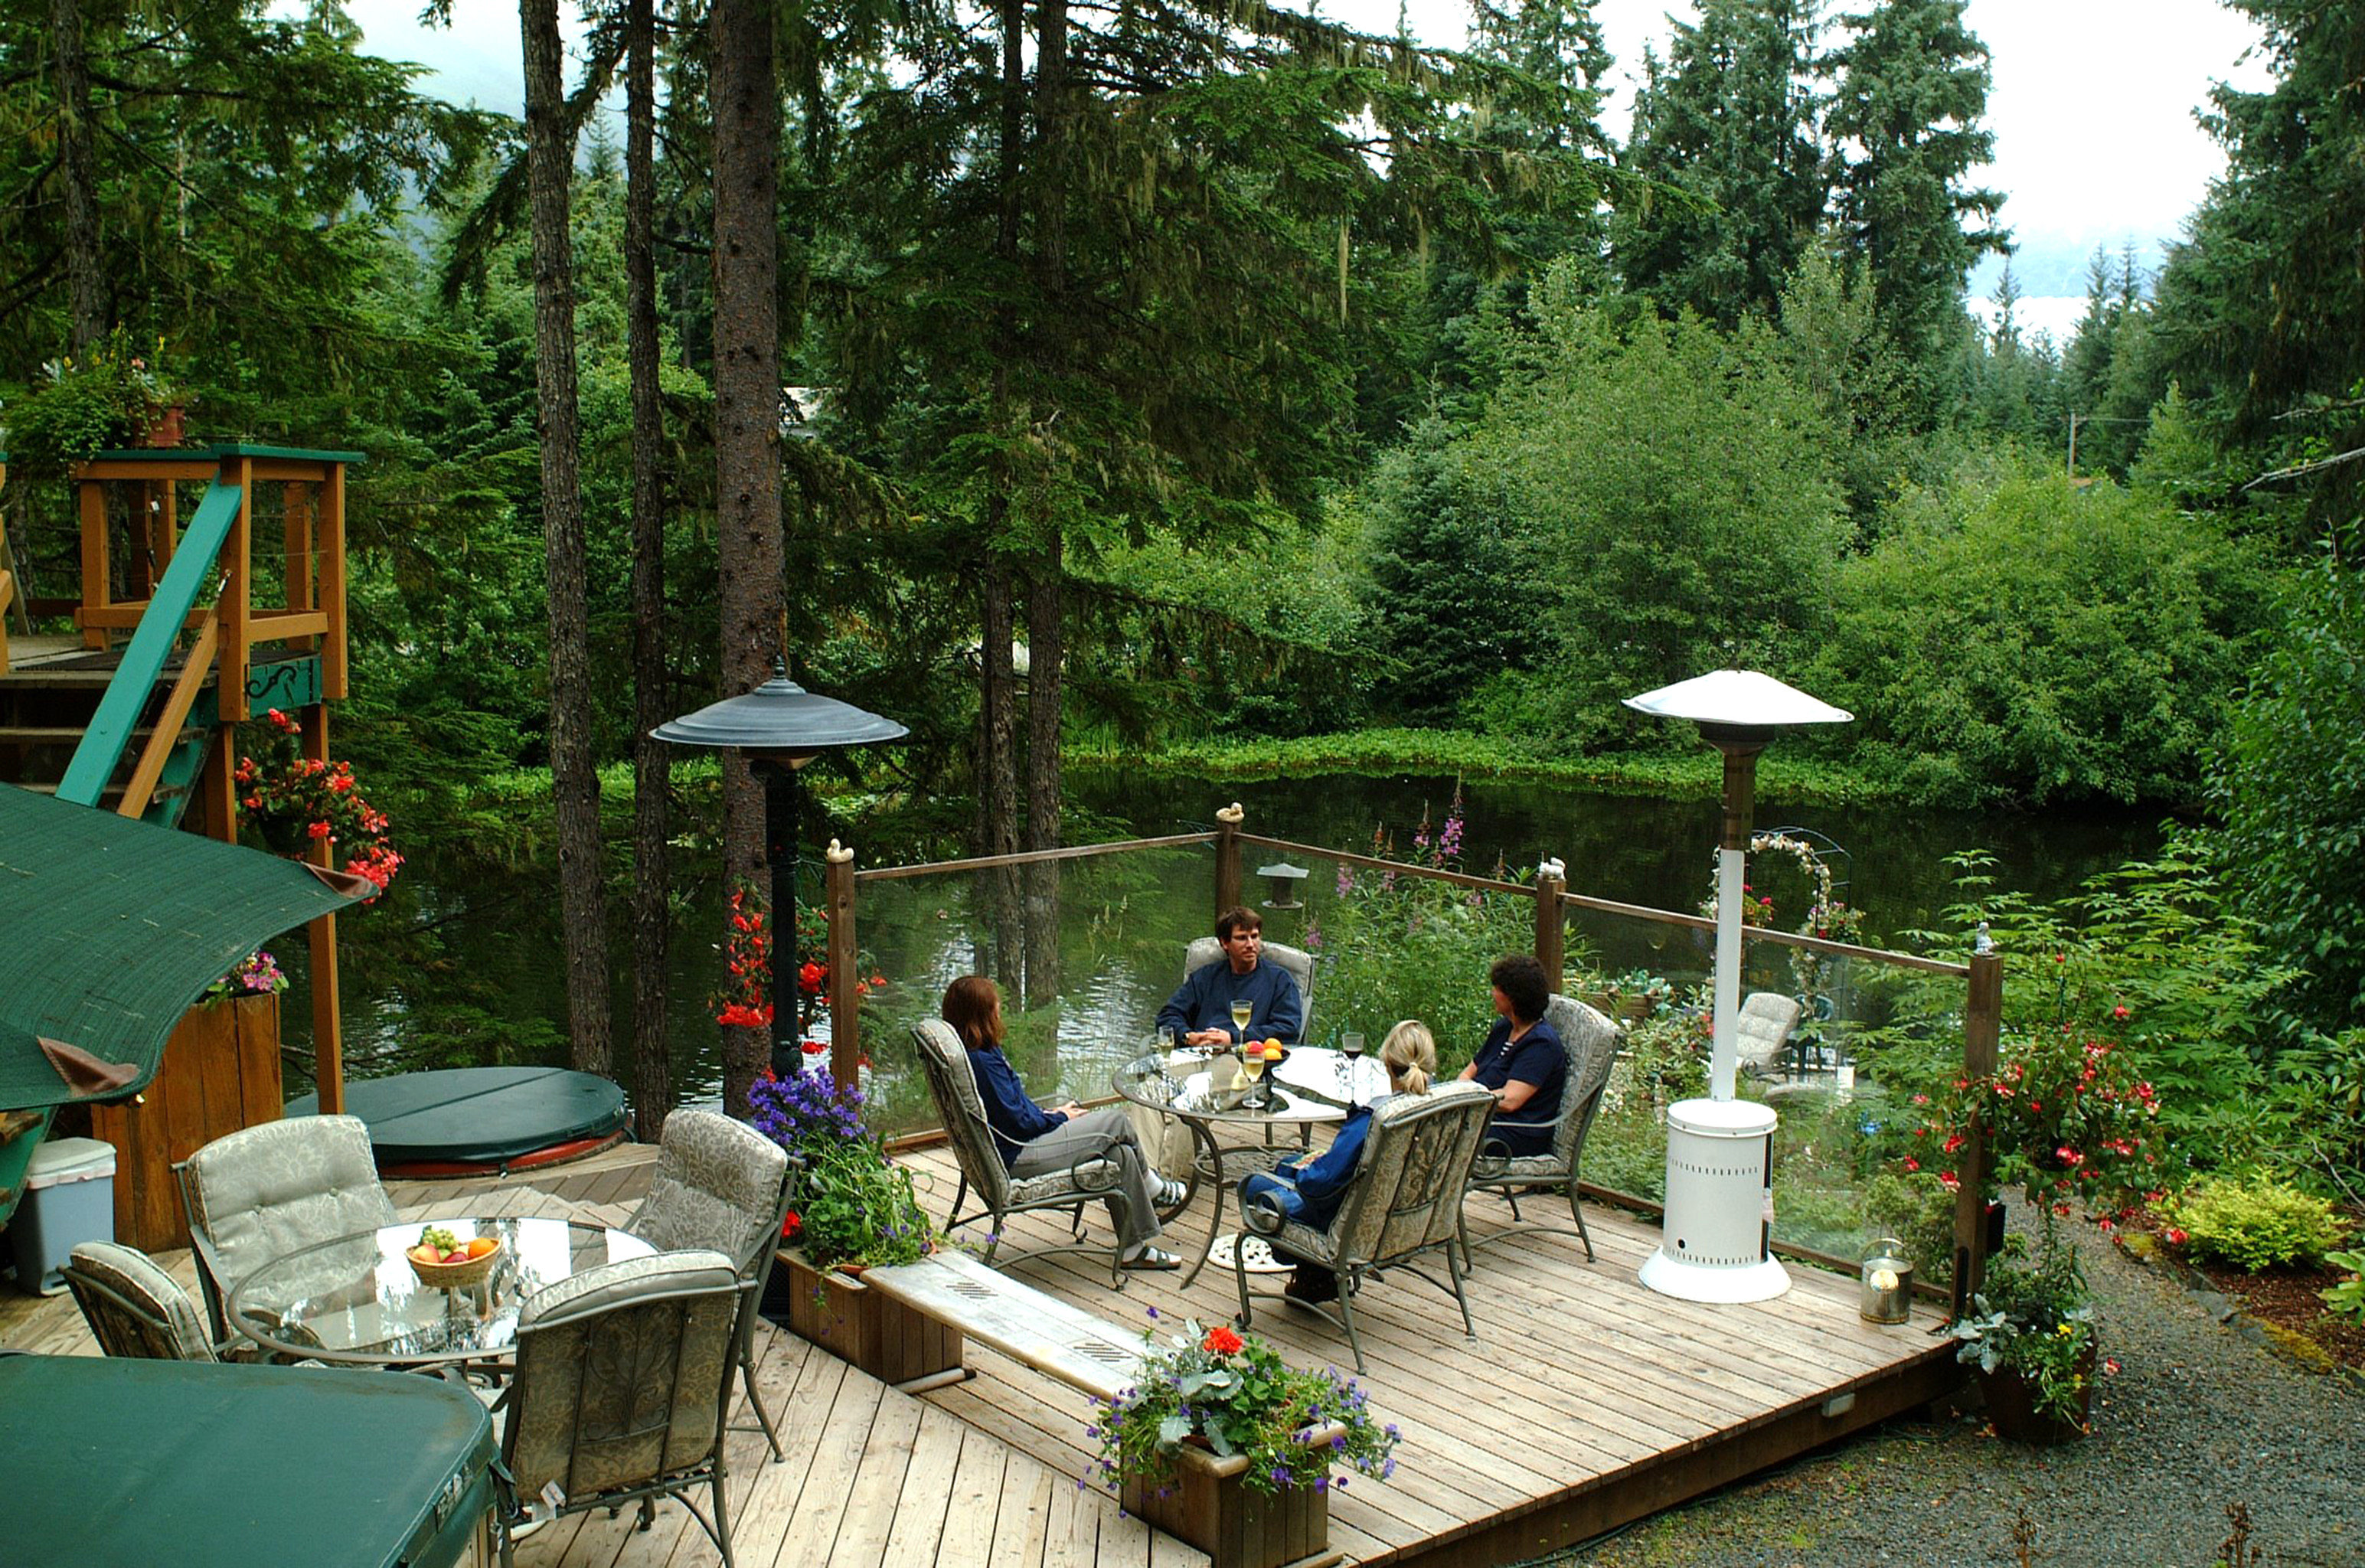 Deck Drink Eat Lake Lodge Outdoors tree backyard Garden yard park Jungle woodland